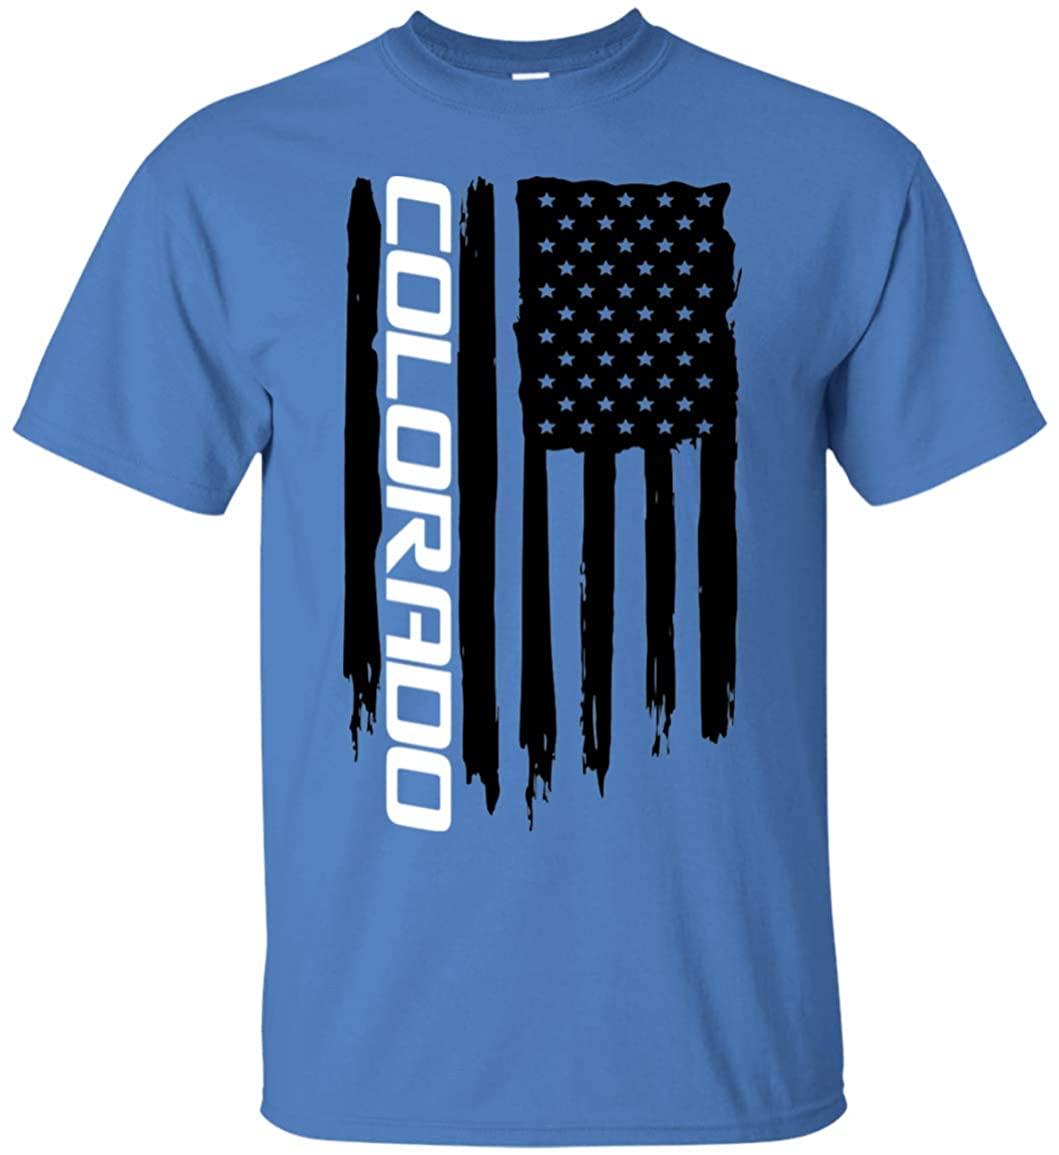 Wheel Spin Addict Men's Colorado Truck American Flag T-Shirt